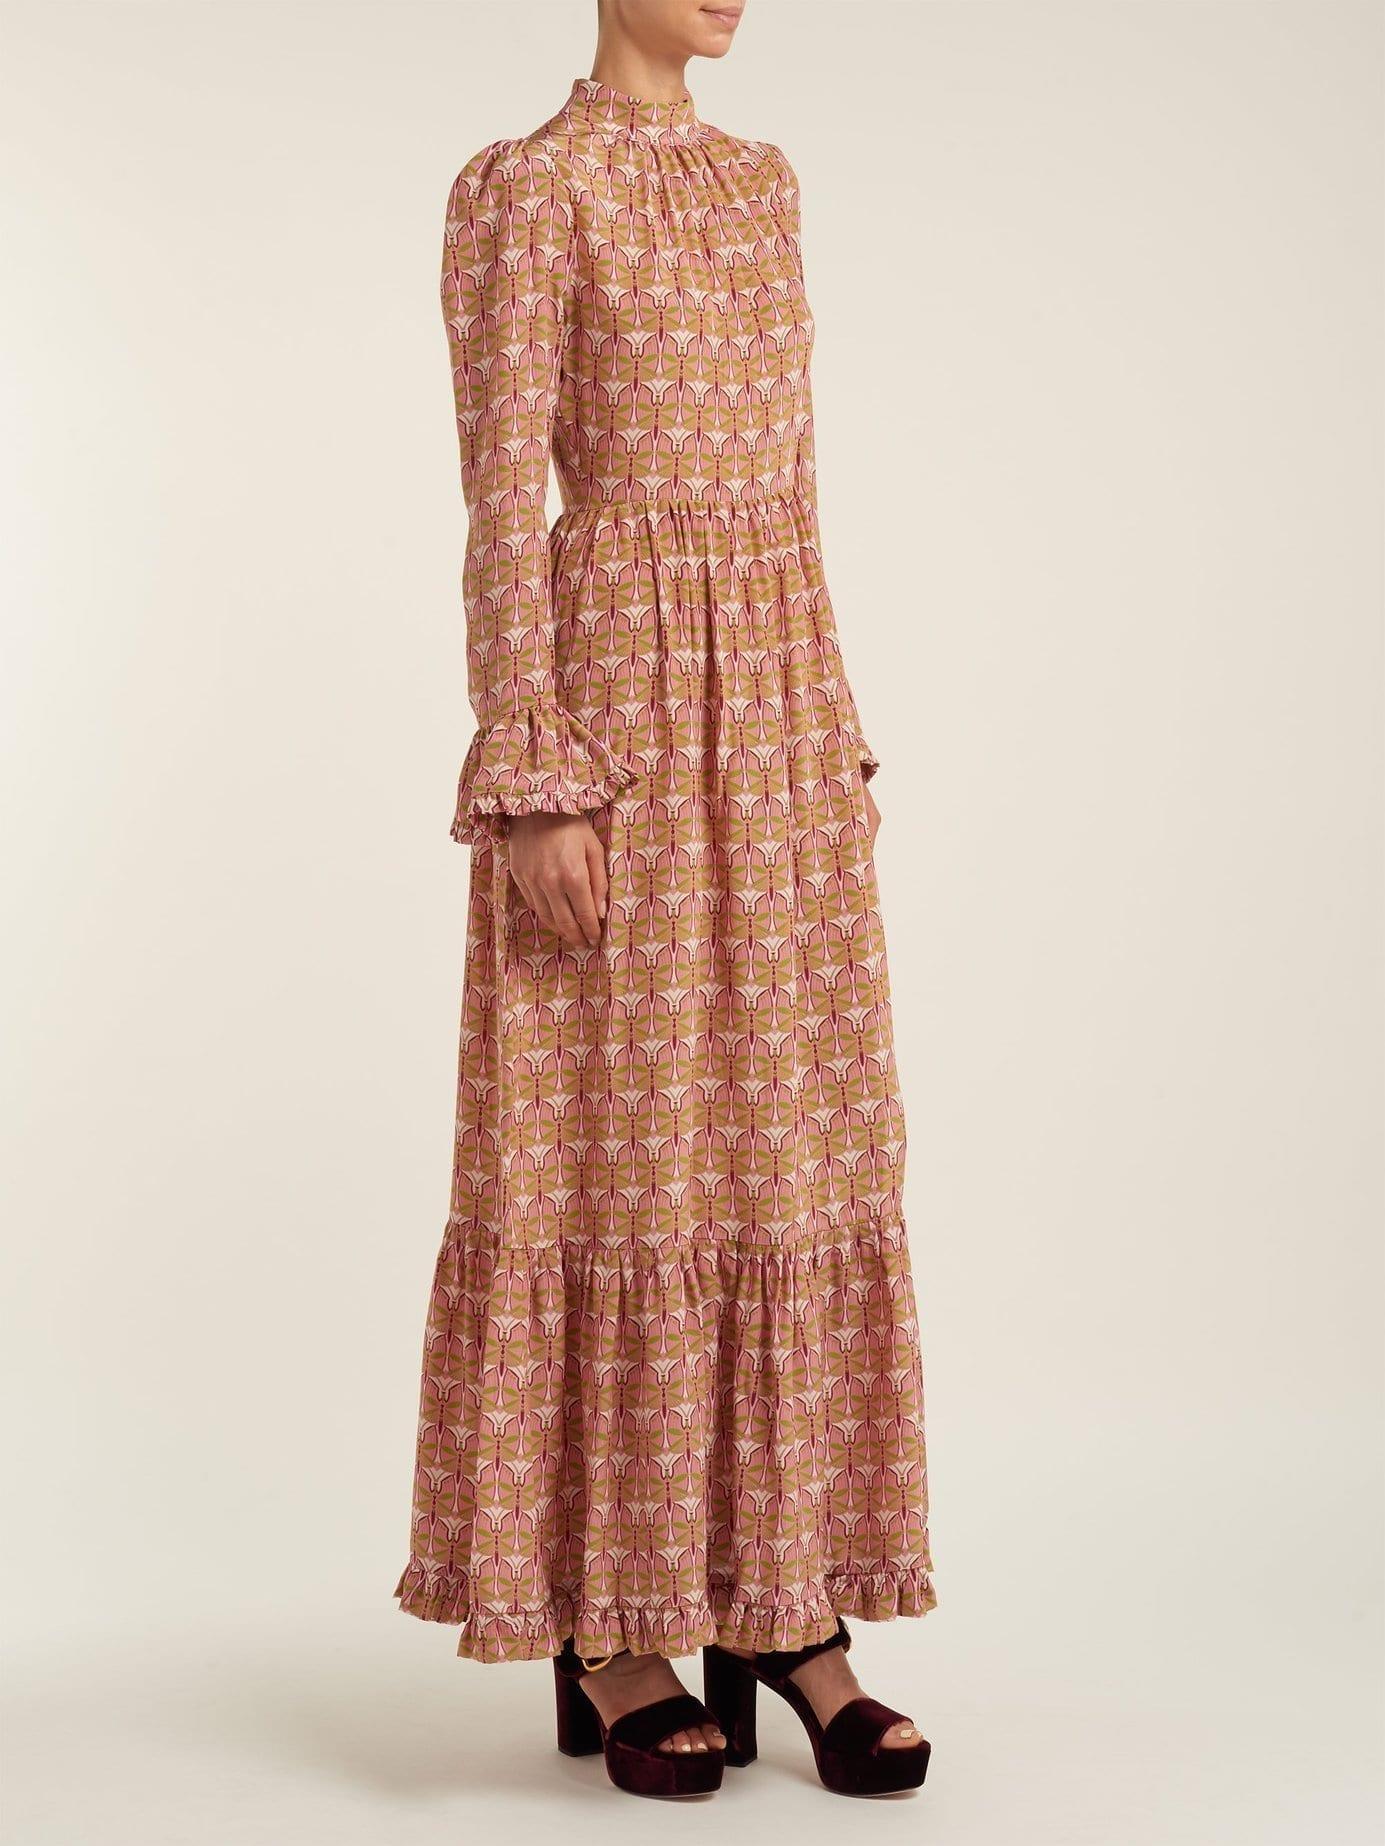 LA DOUBLEJ EDITIONS Visconti Dragonfly Print Silk Pink Dress